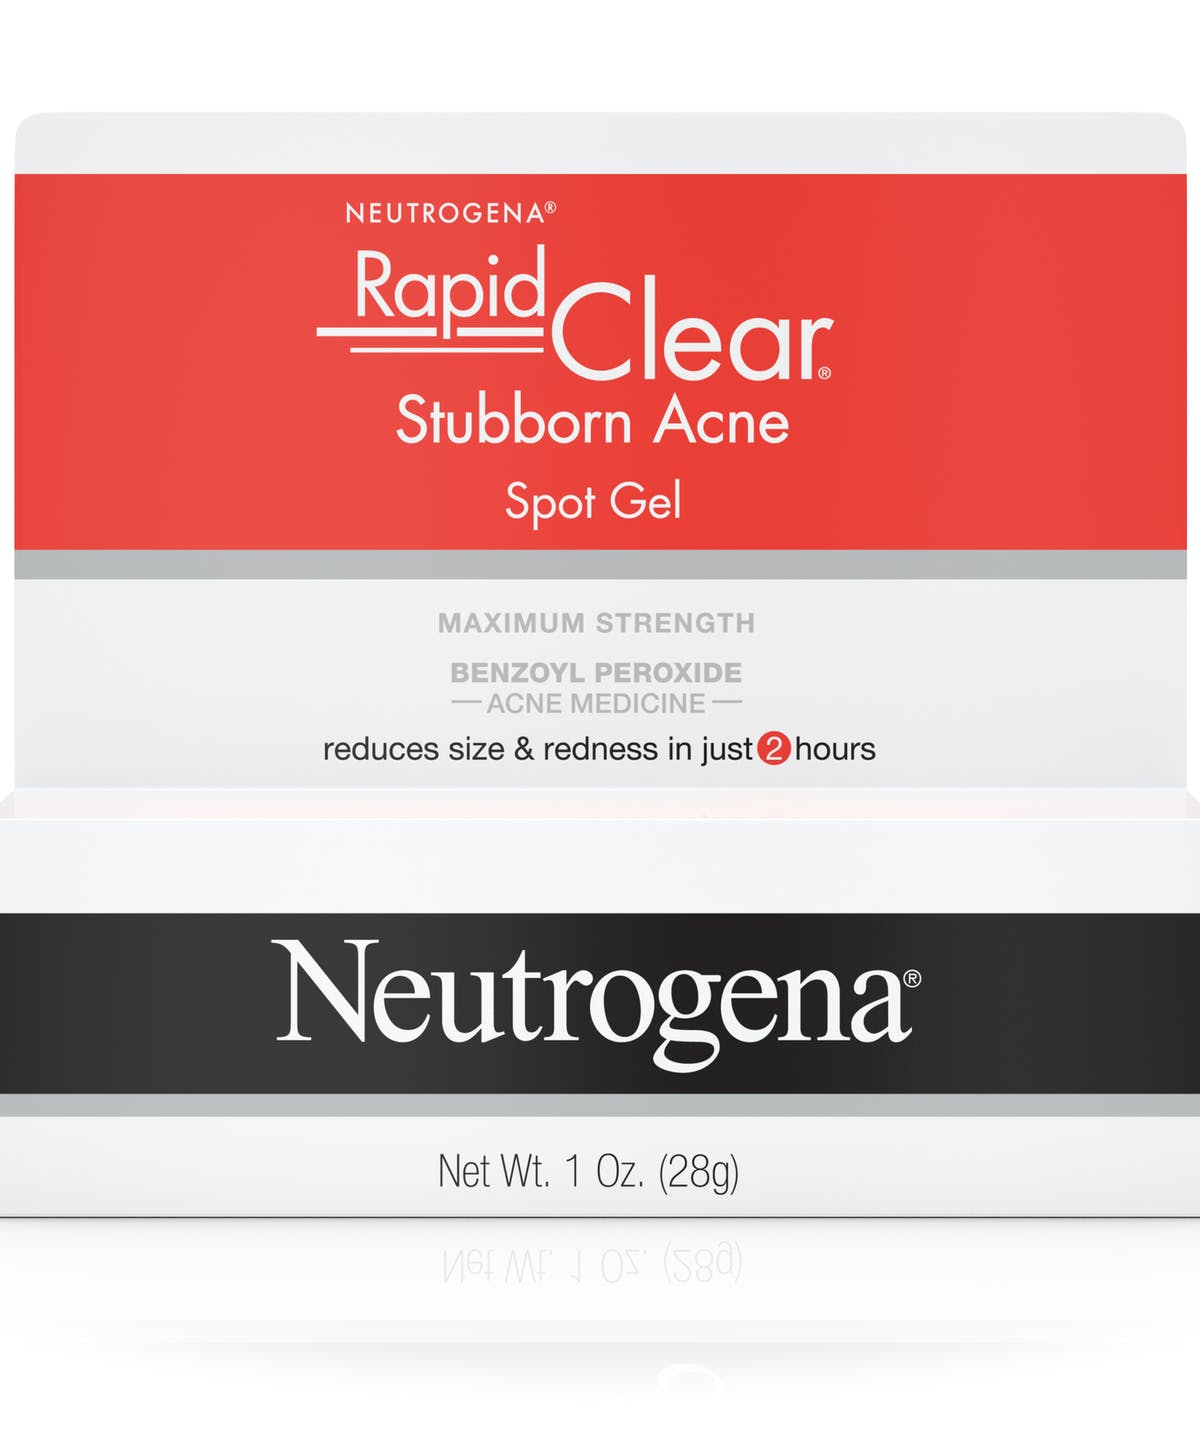 Rapid Clear Acne Treatment With Benzoyl Peroxide Neutrogena